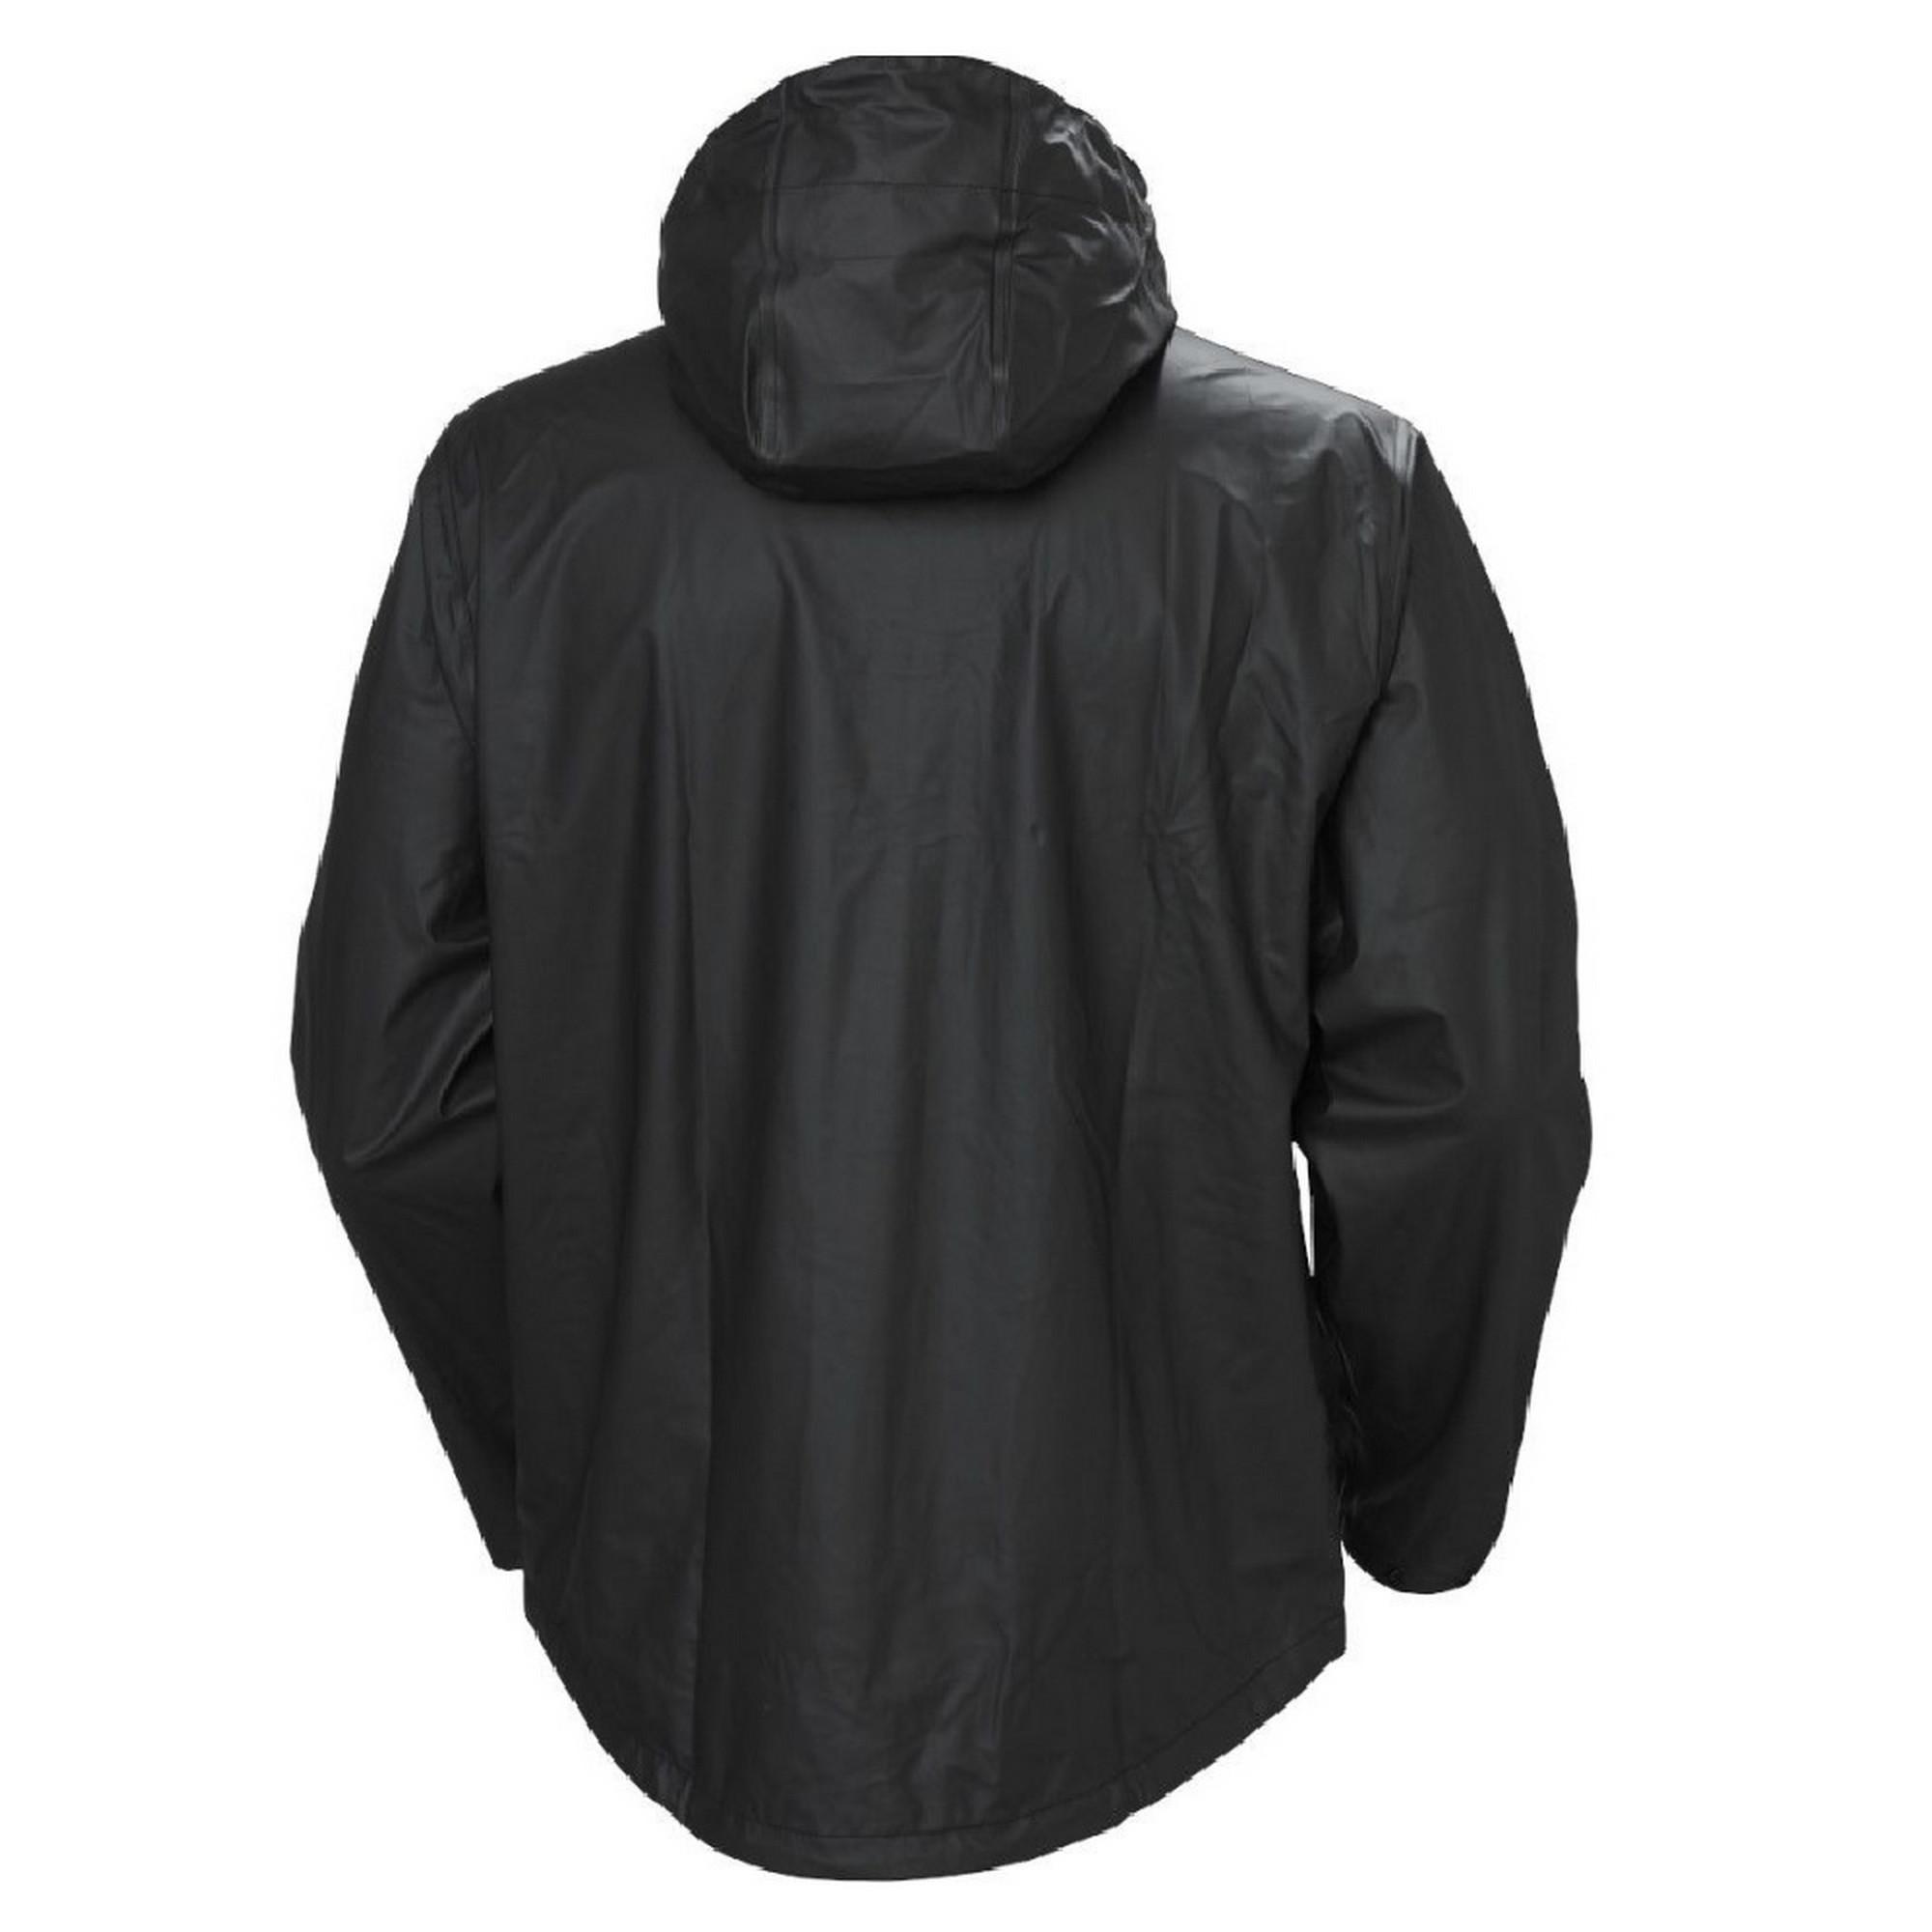 helly hansen voss casual zip up hooded waterproof jacket coat mens workwear ebay. Black Bedroom Furniture Sets. Home Design Ideas